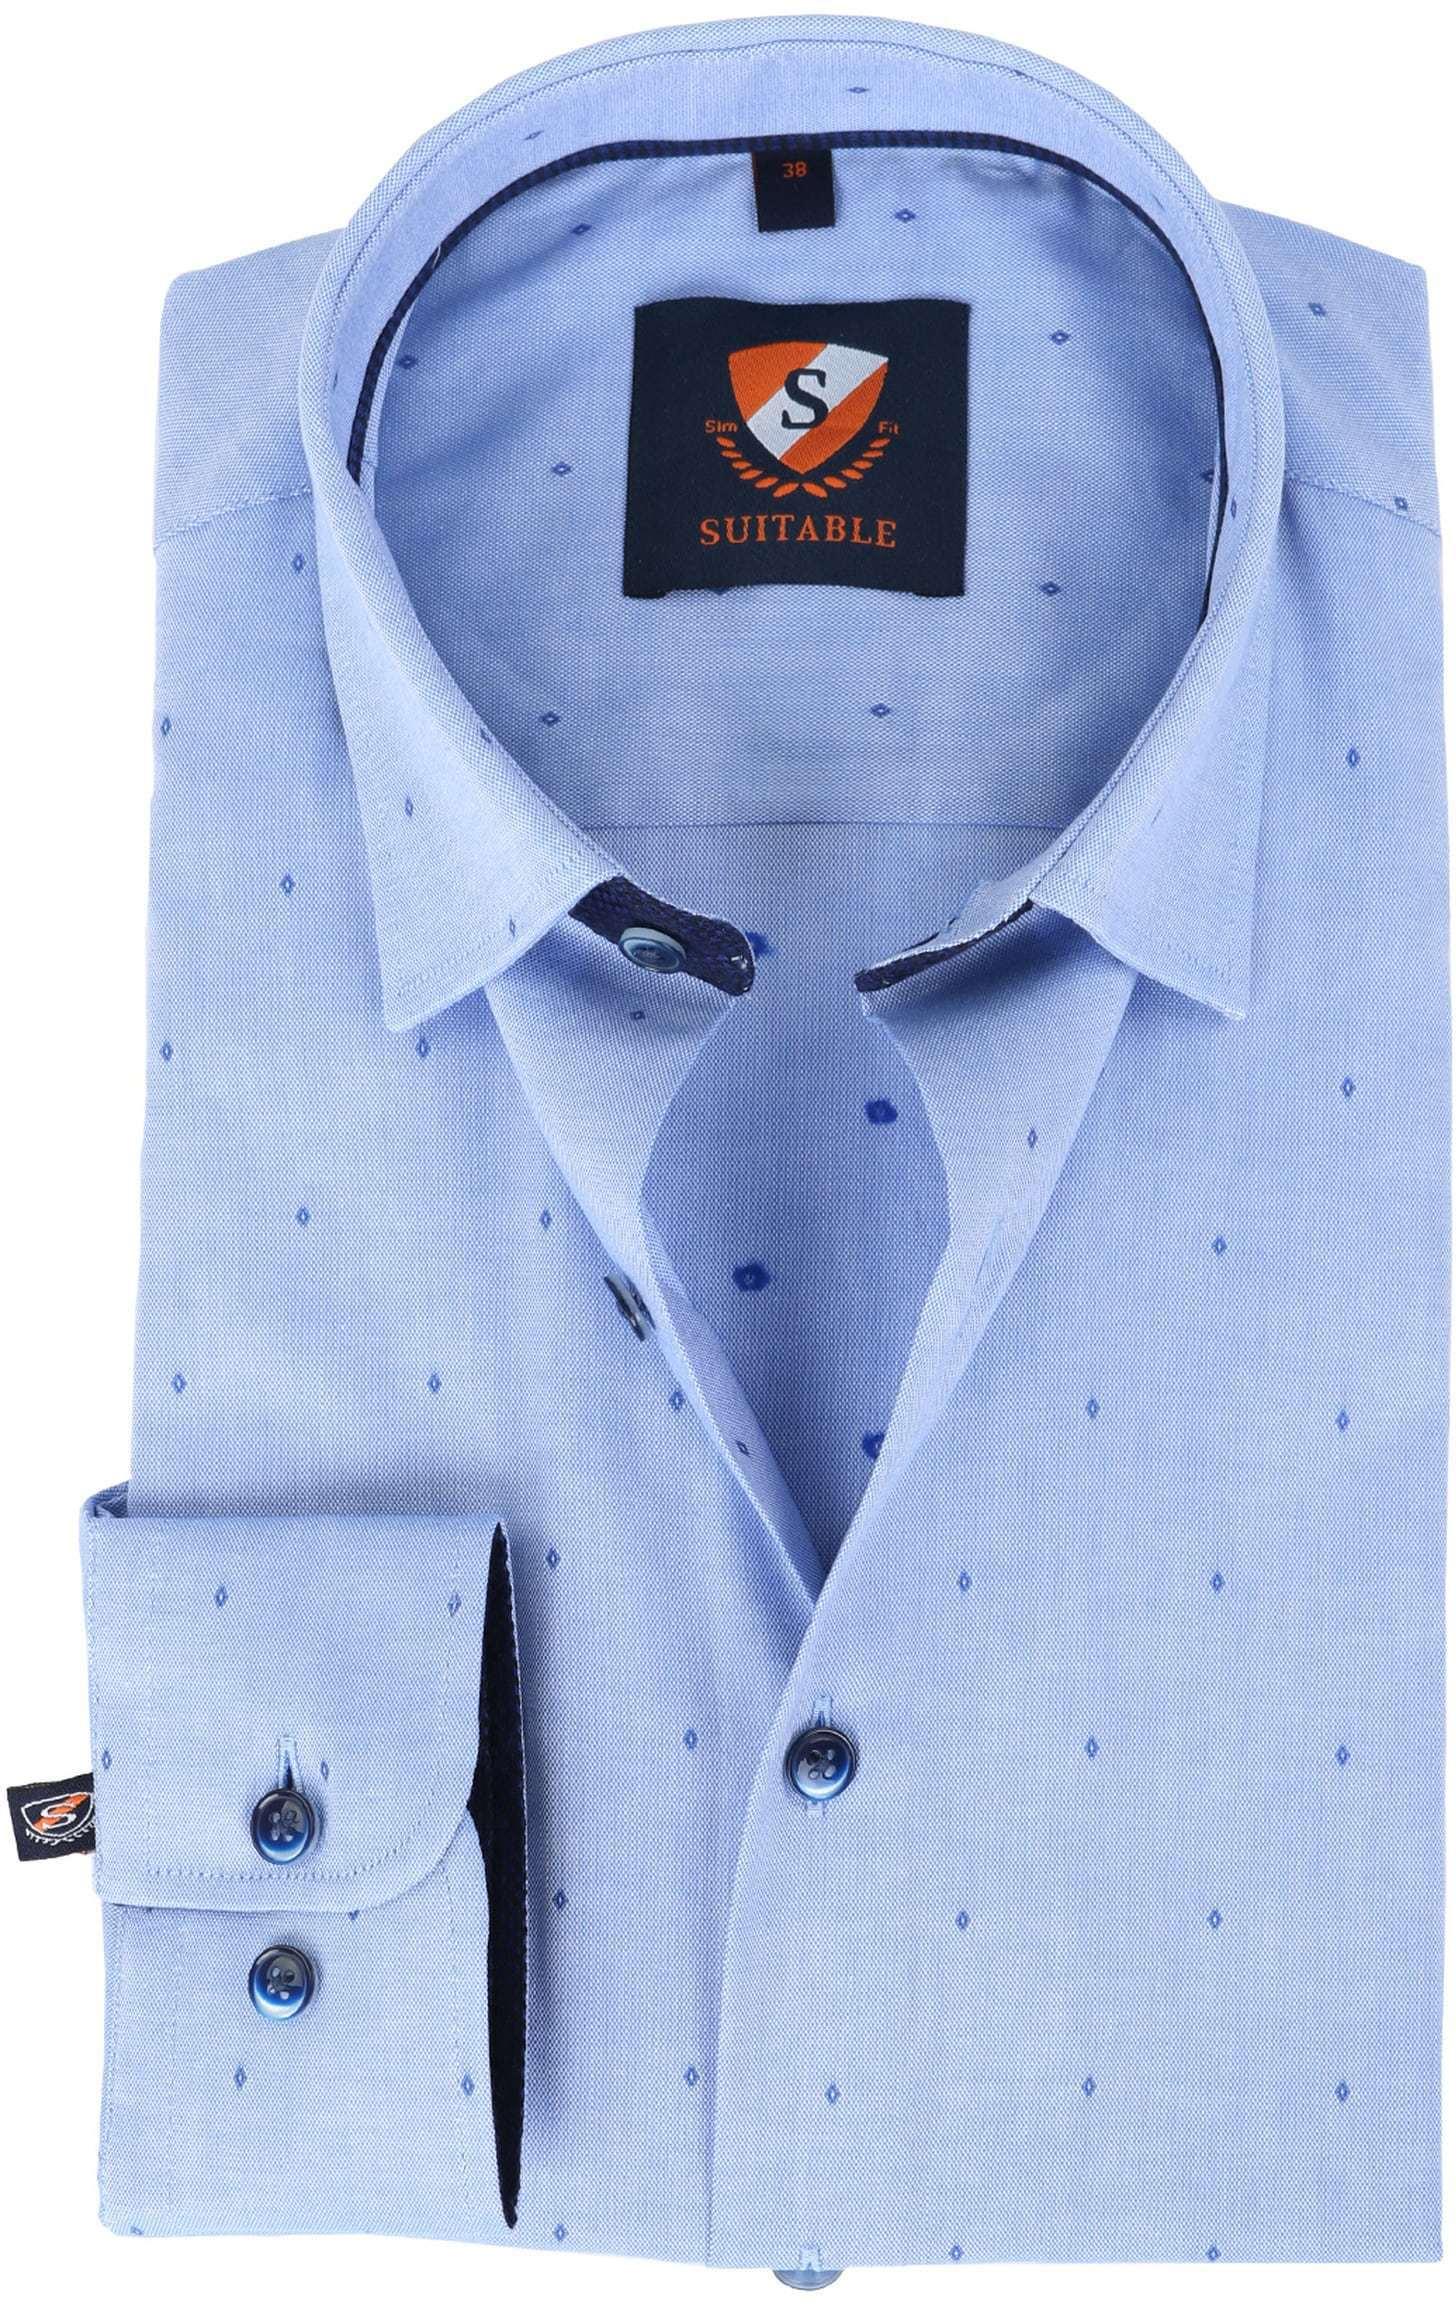 Suitable Overhemd Blauw Oxford foto 0